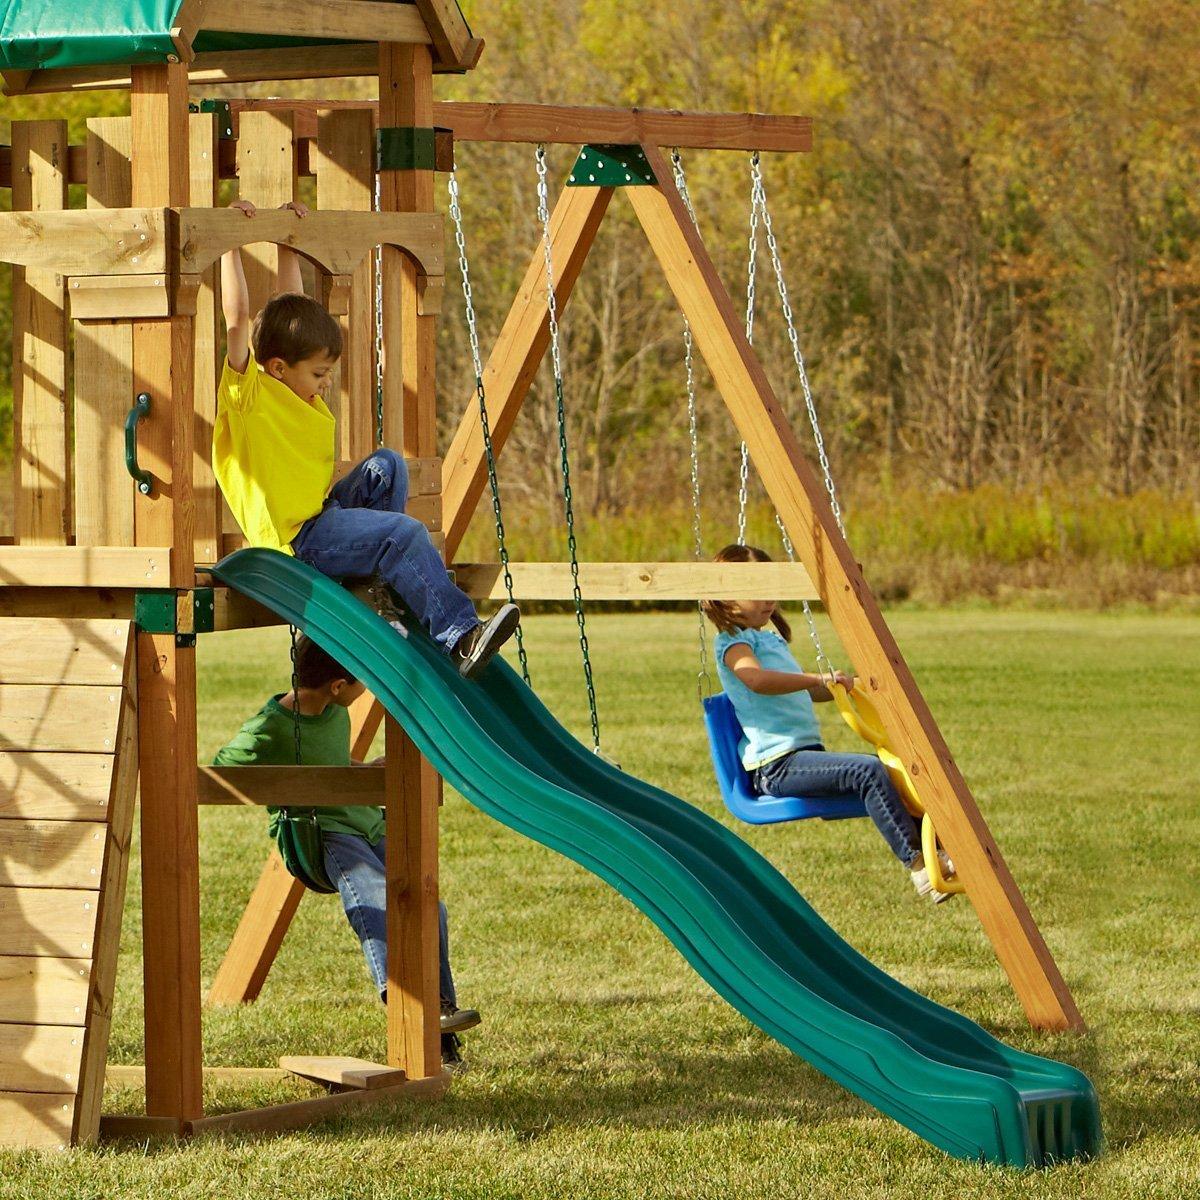 Swing Set Slide Wave Outdoor Kids Playground Playset ...